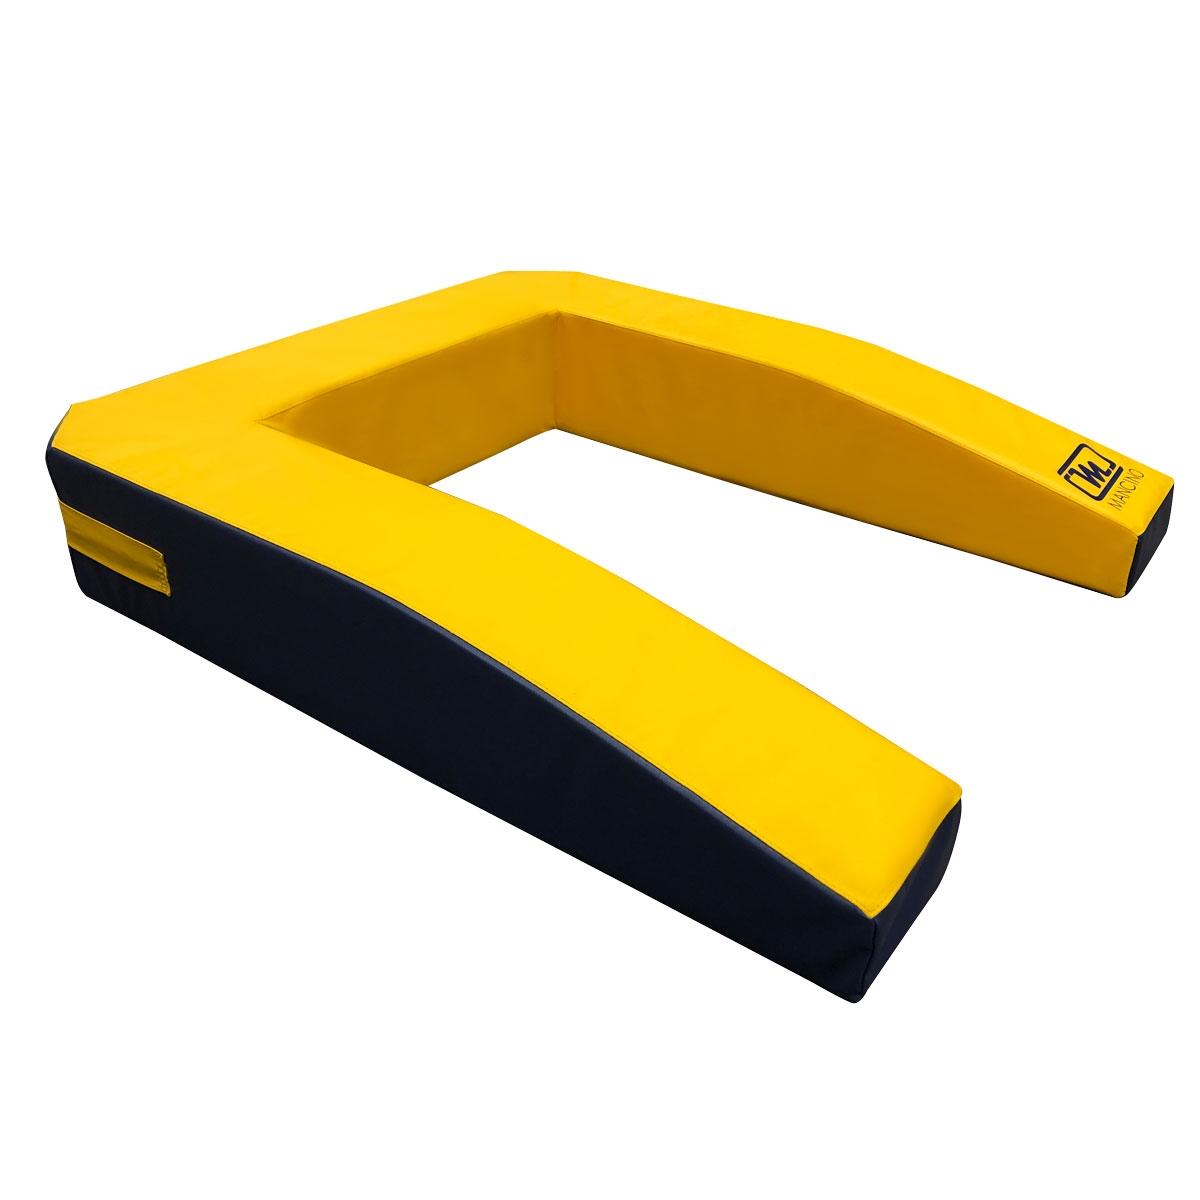 vault spring board safety zone mat for gymnastics vaulting